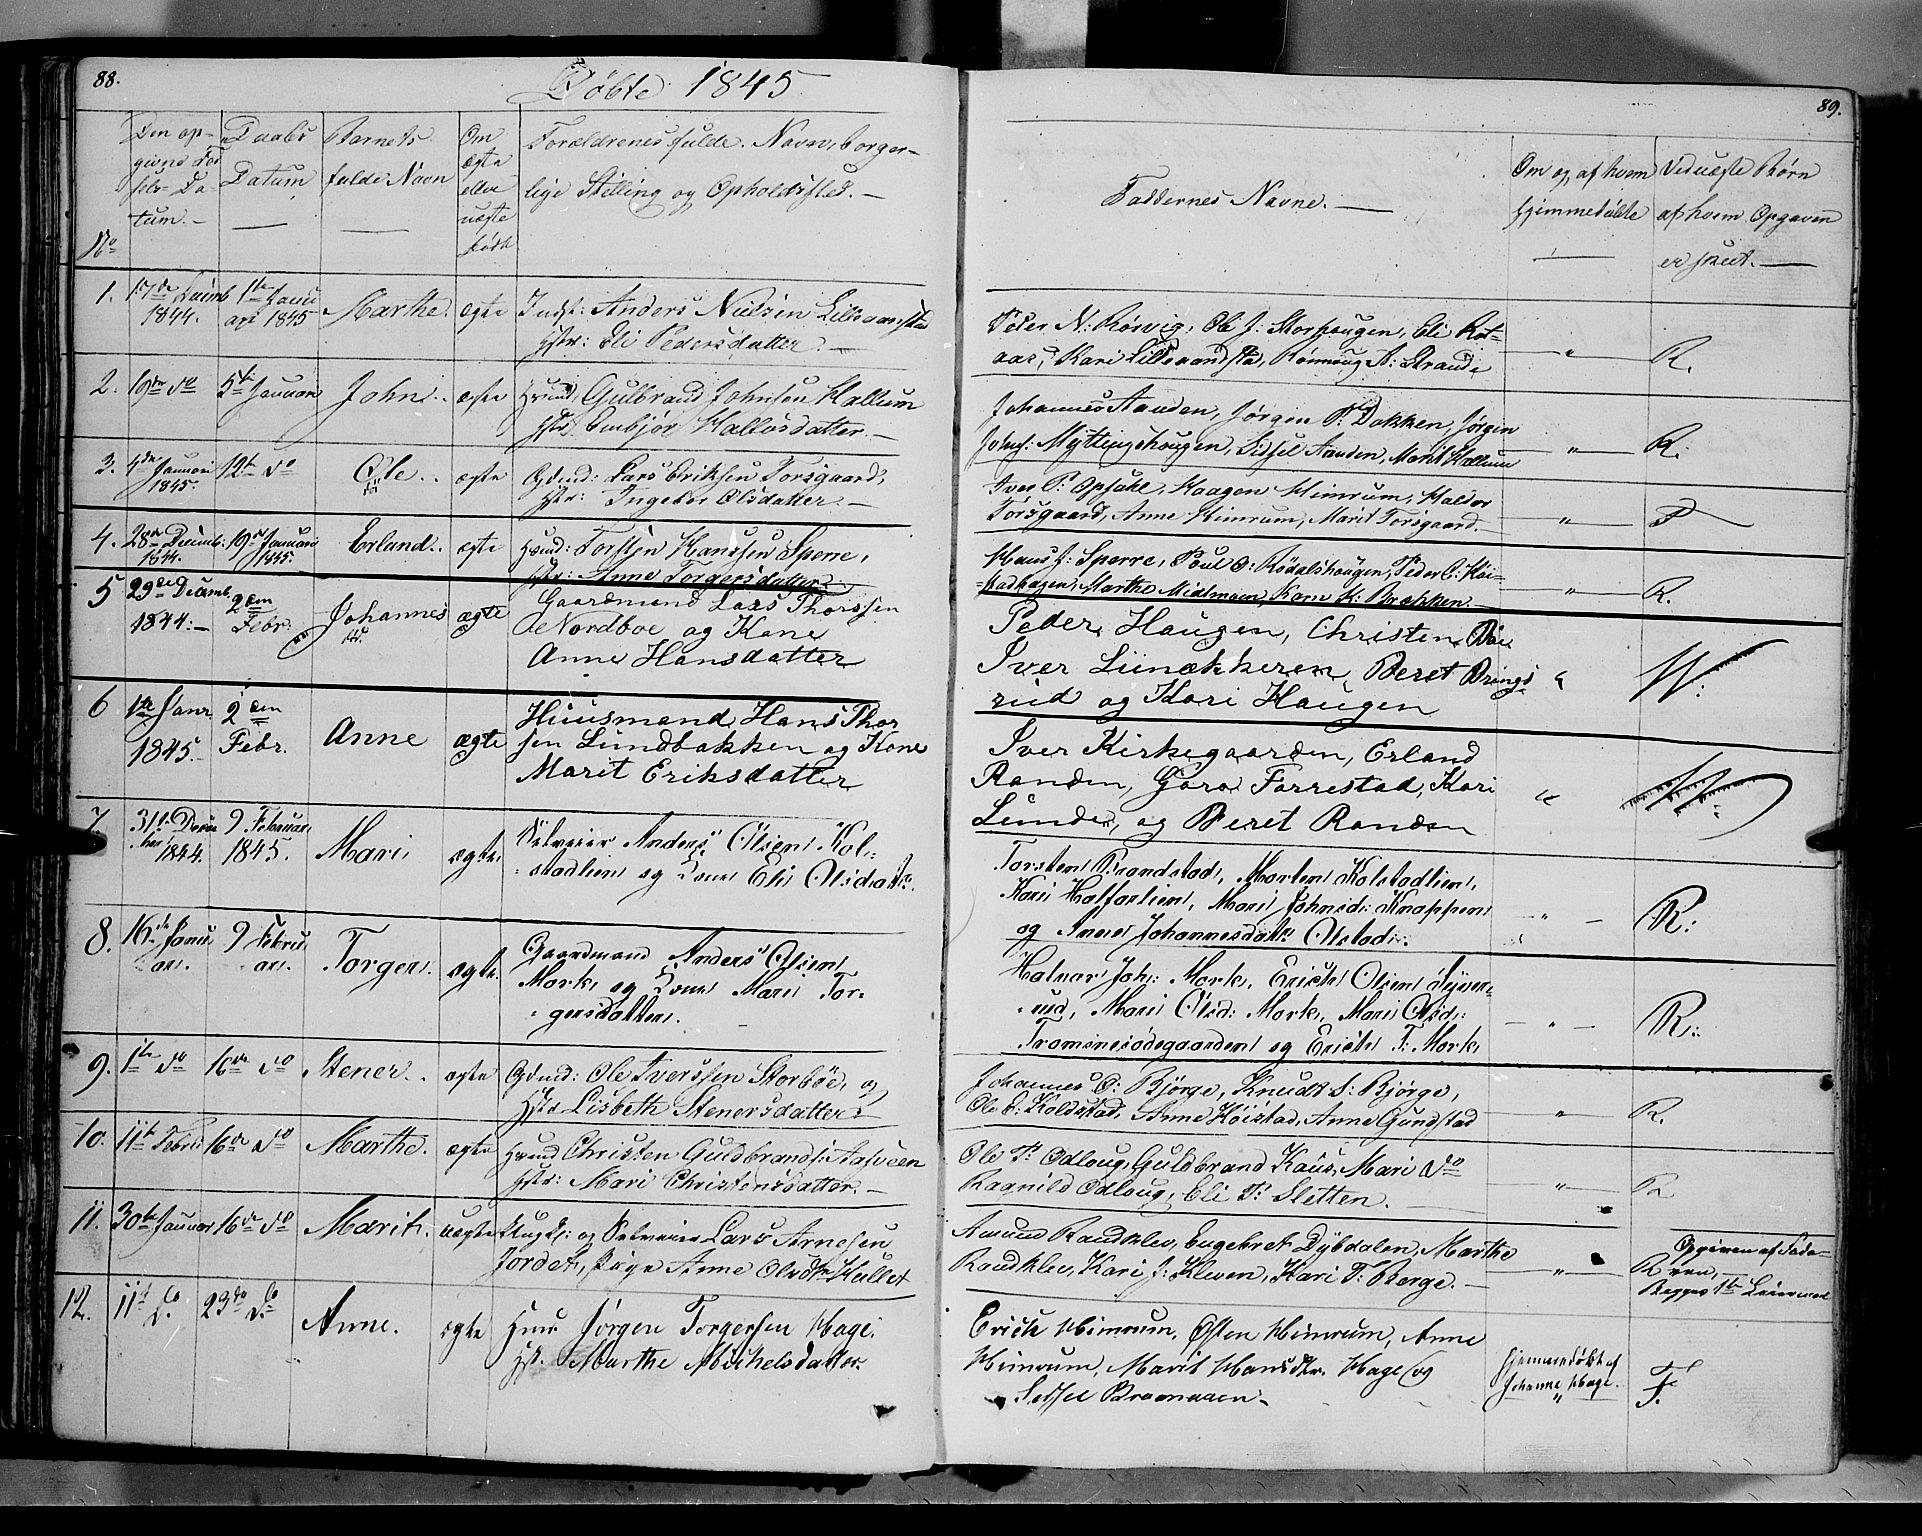 SAH, Ringebu prestekontor, Ministerialbok nr. 5, 1839-1848, s. 88-89